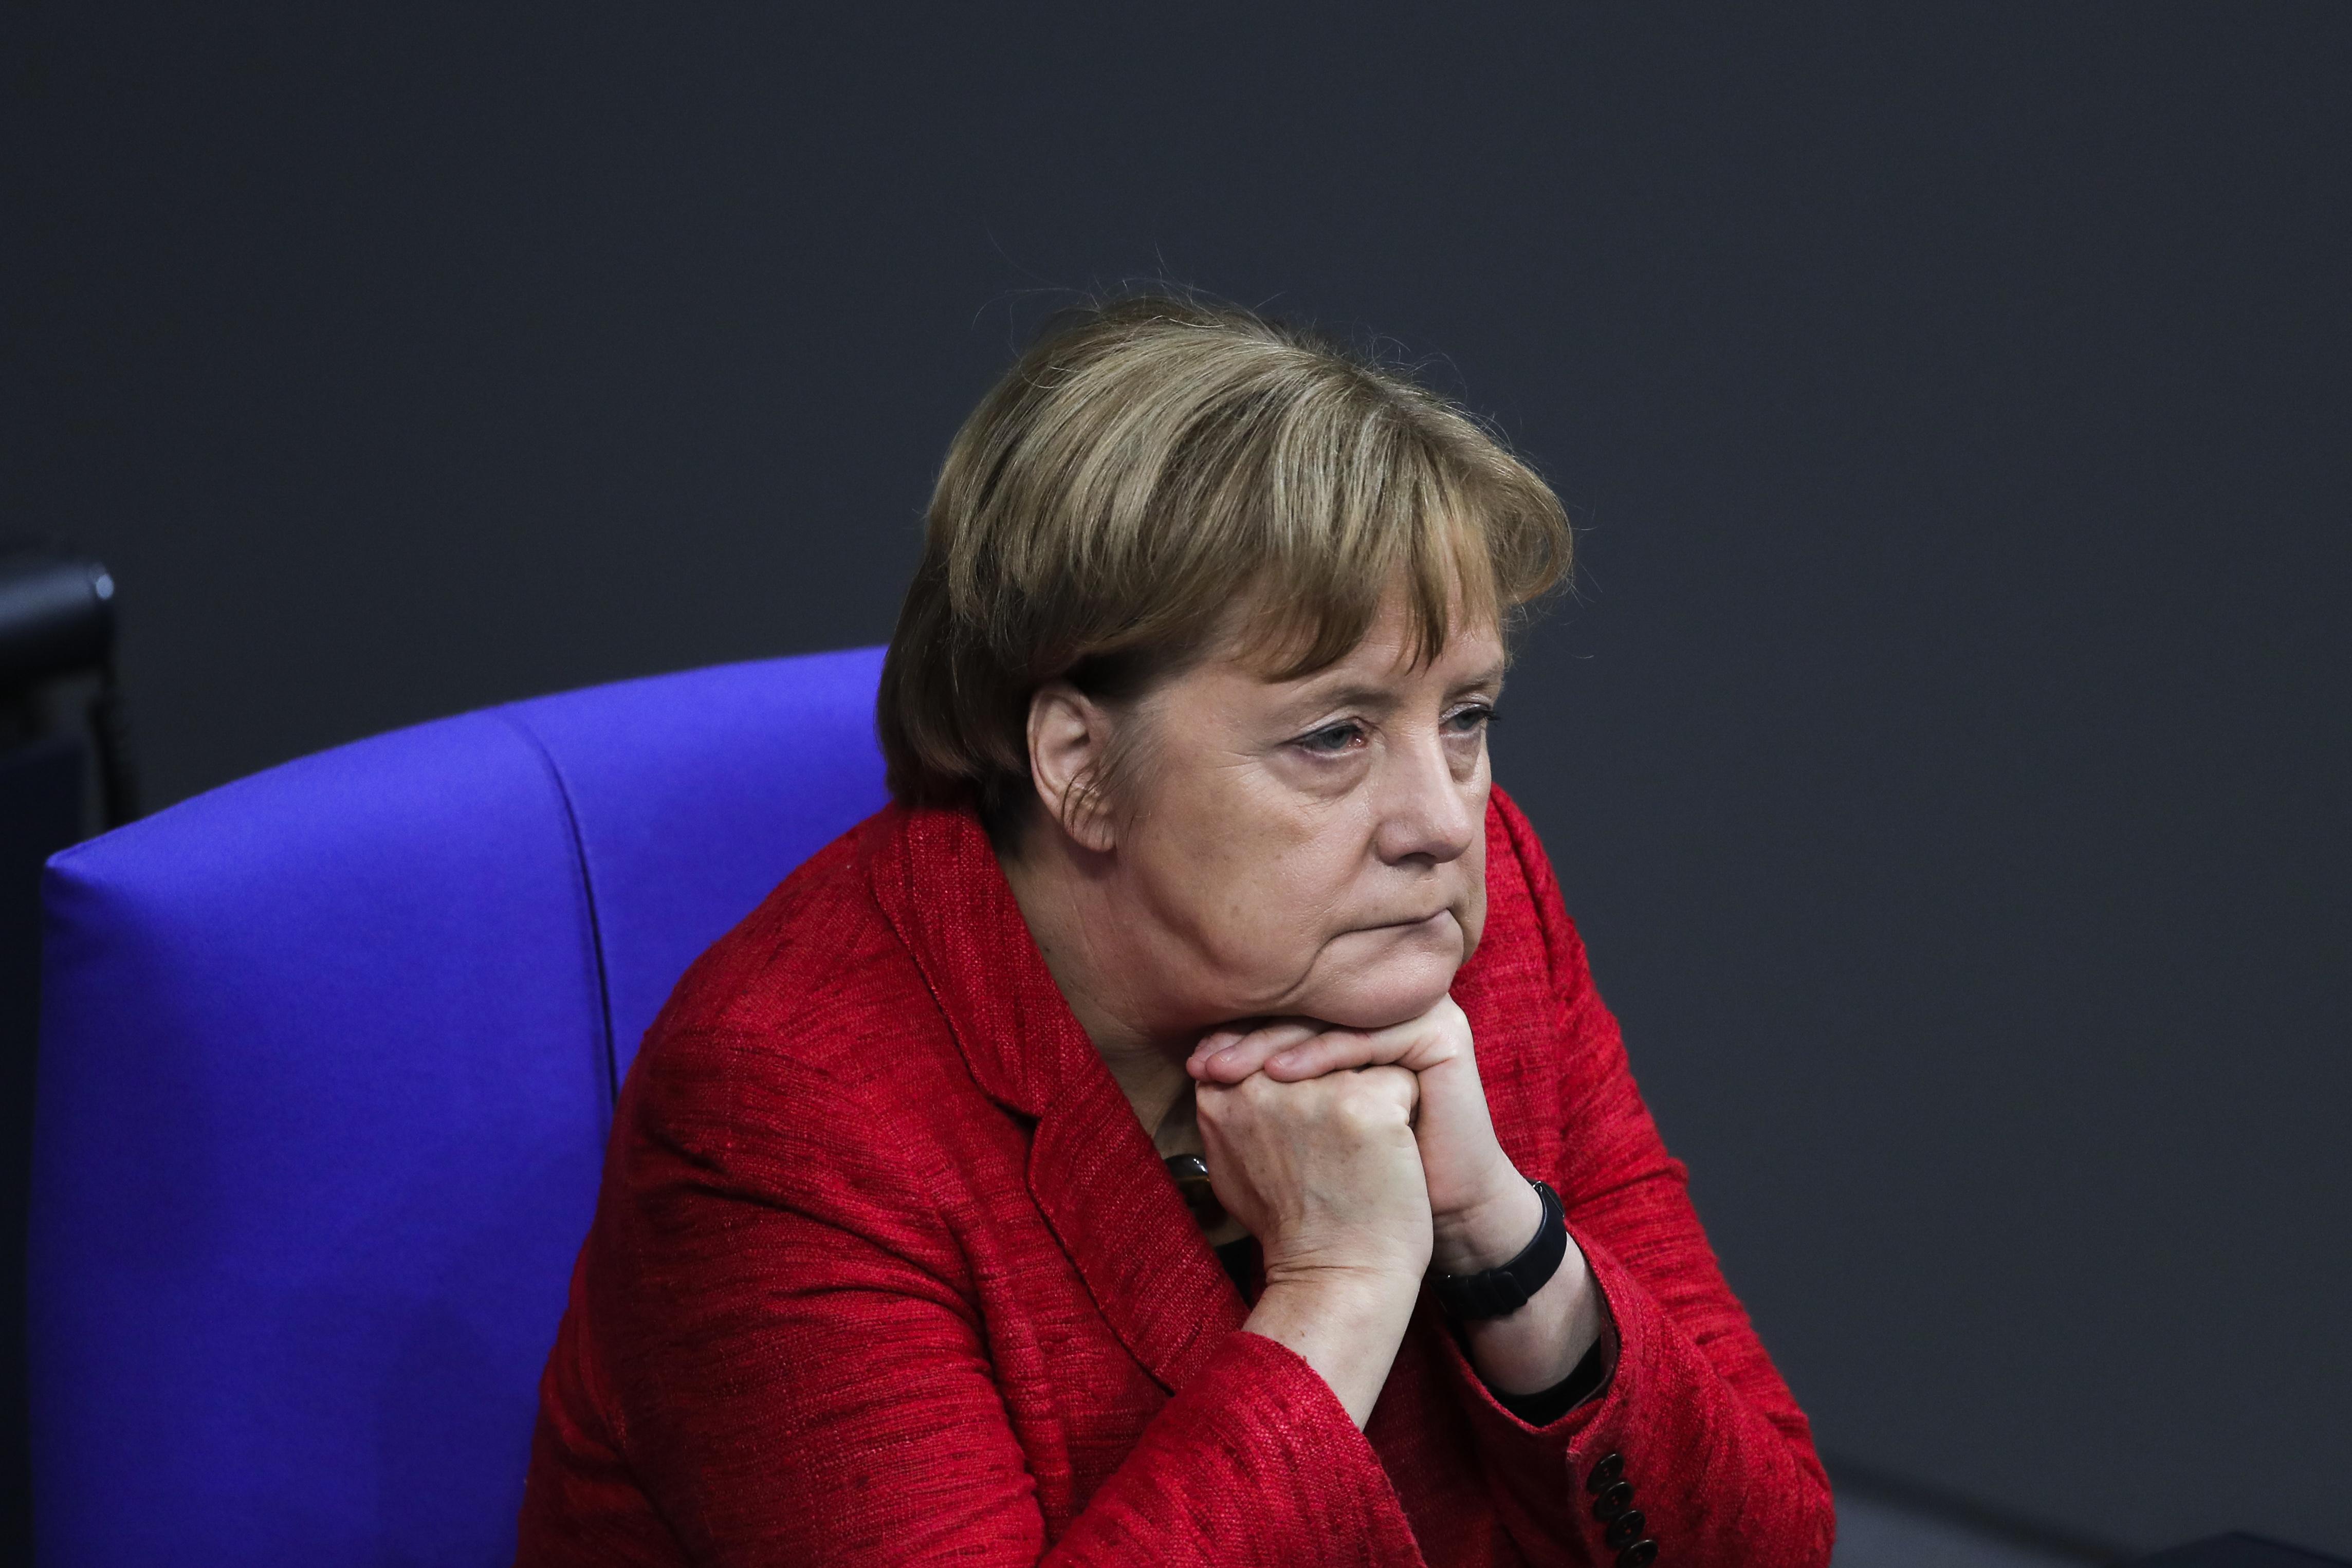 German Chancellor Angela Merkel attends a plenary session of German parliament Bundestag in Berlin, Tuesday, Nov. 21, 2017. (AP Photo/Markus Schreiber)